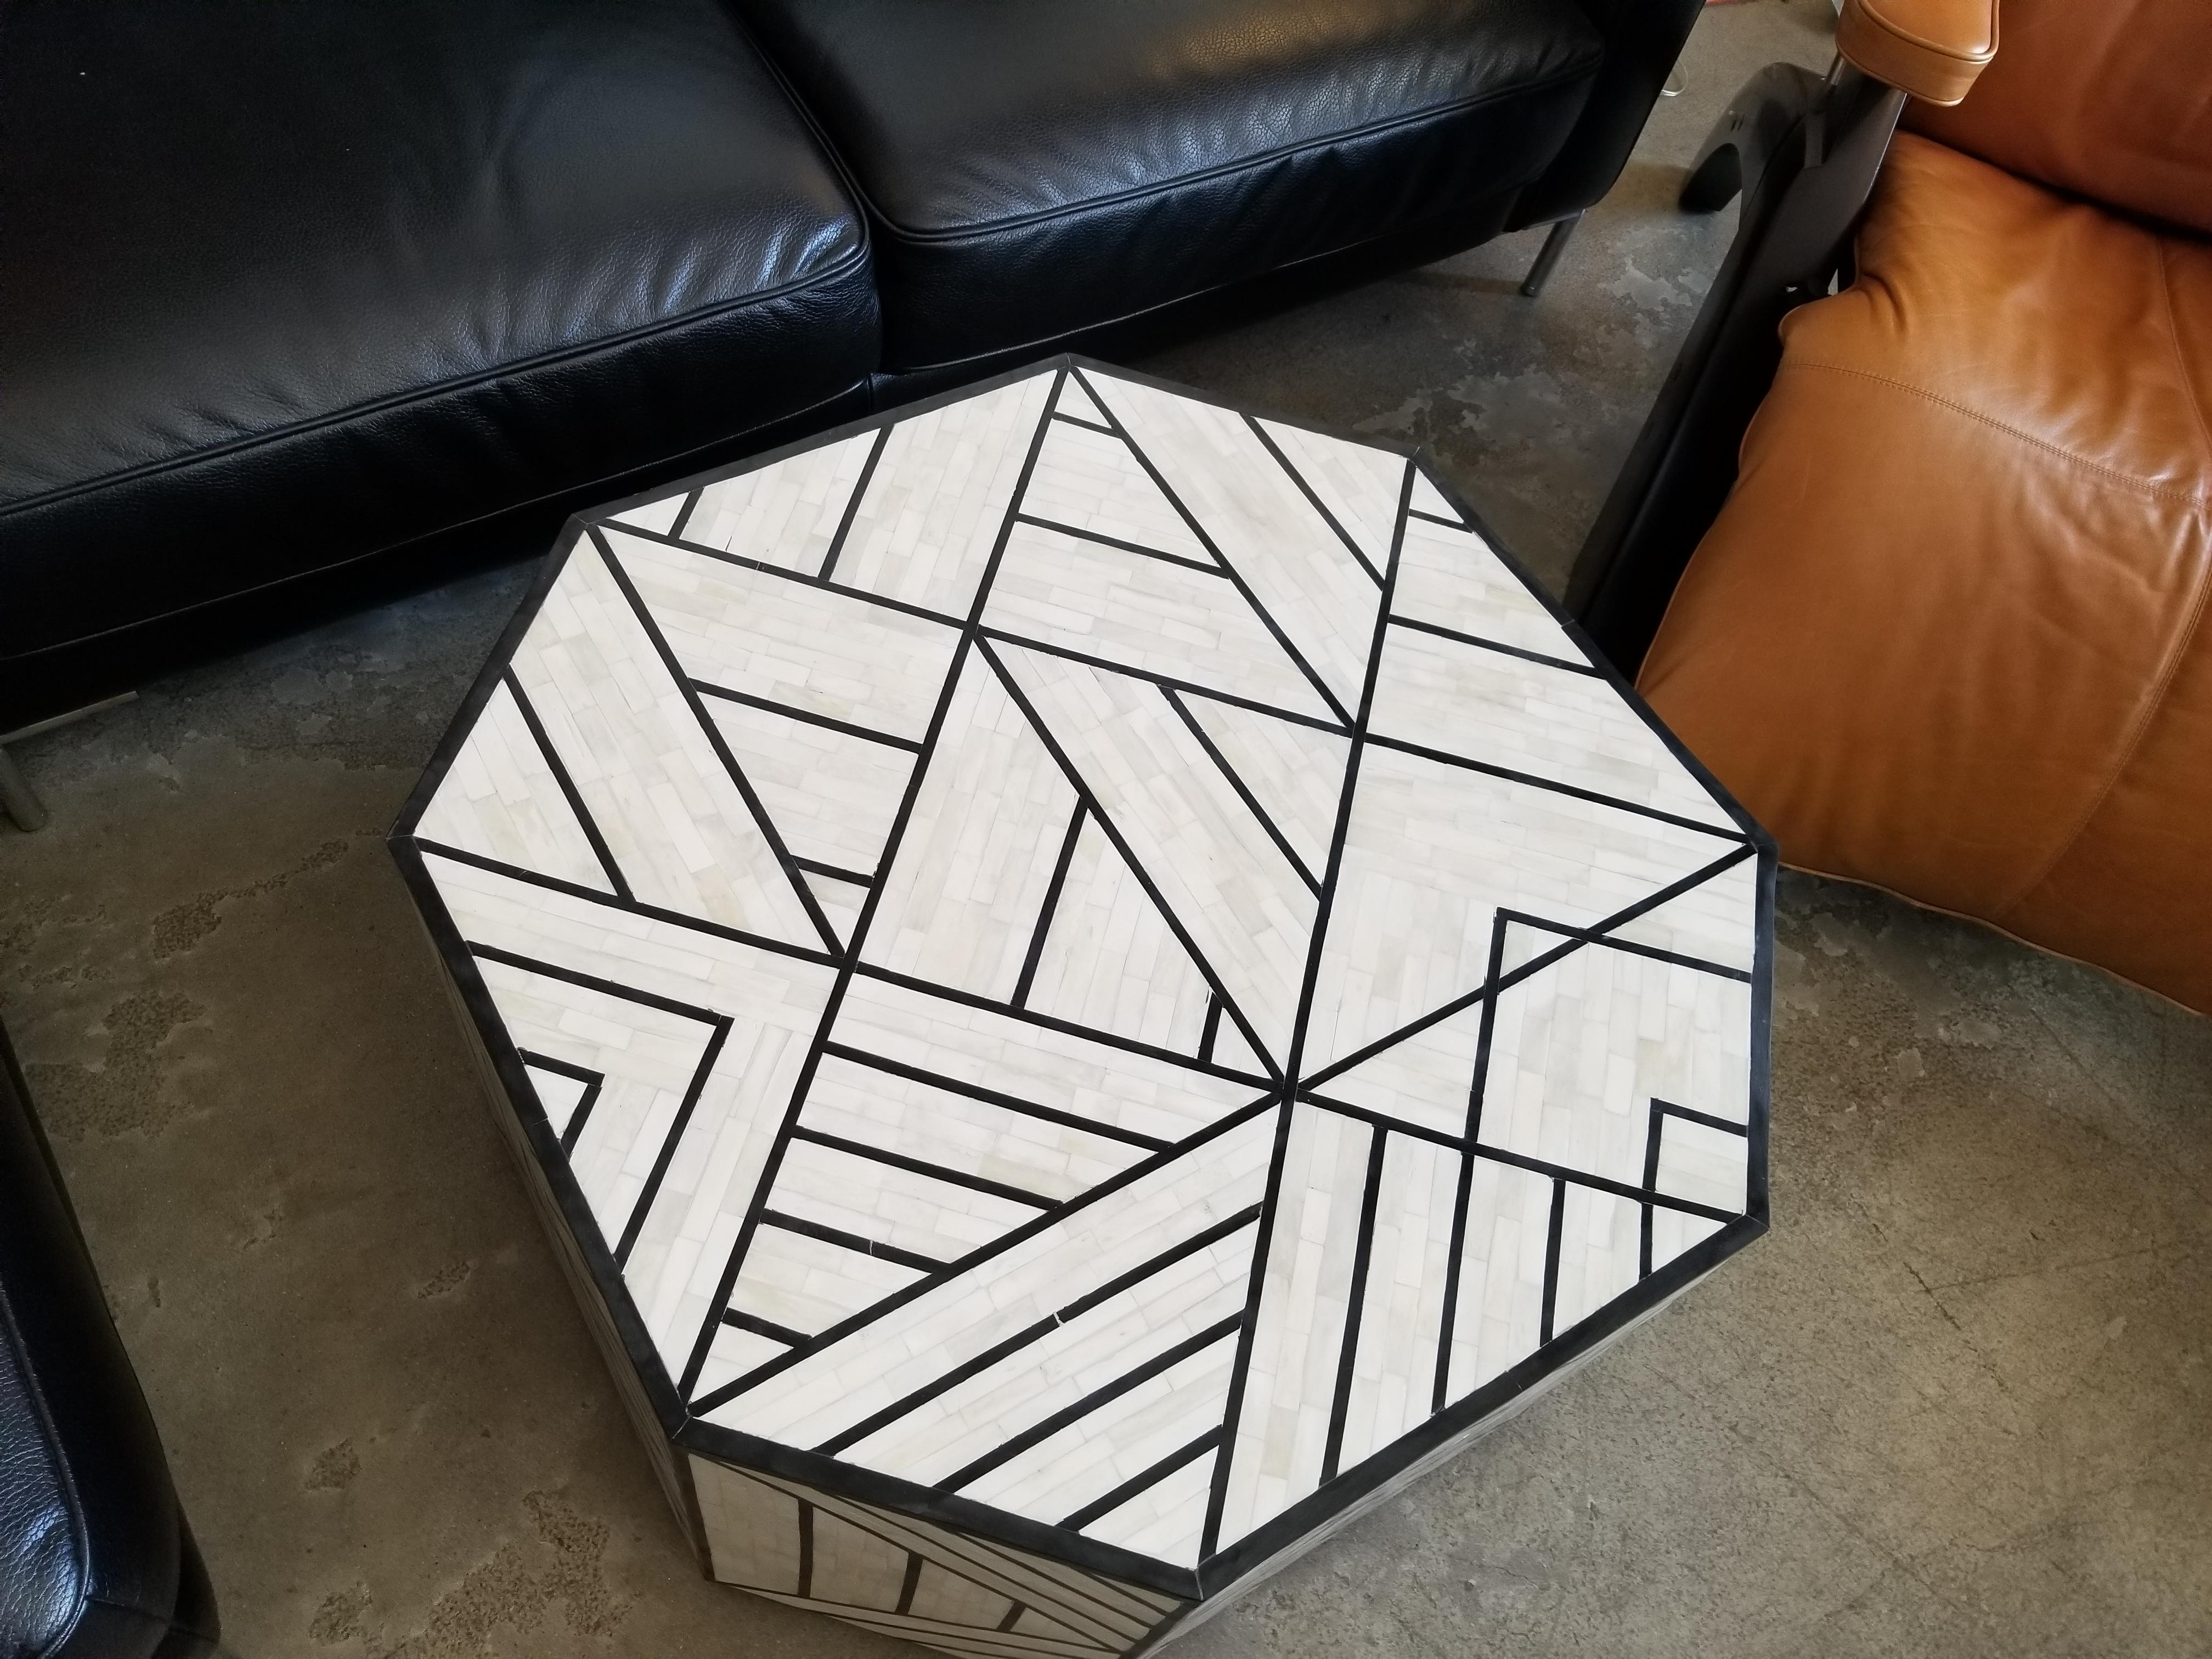 modern west elm octoganol coffee table in black white bone inlay